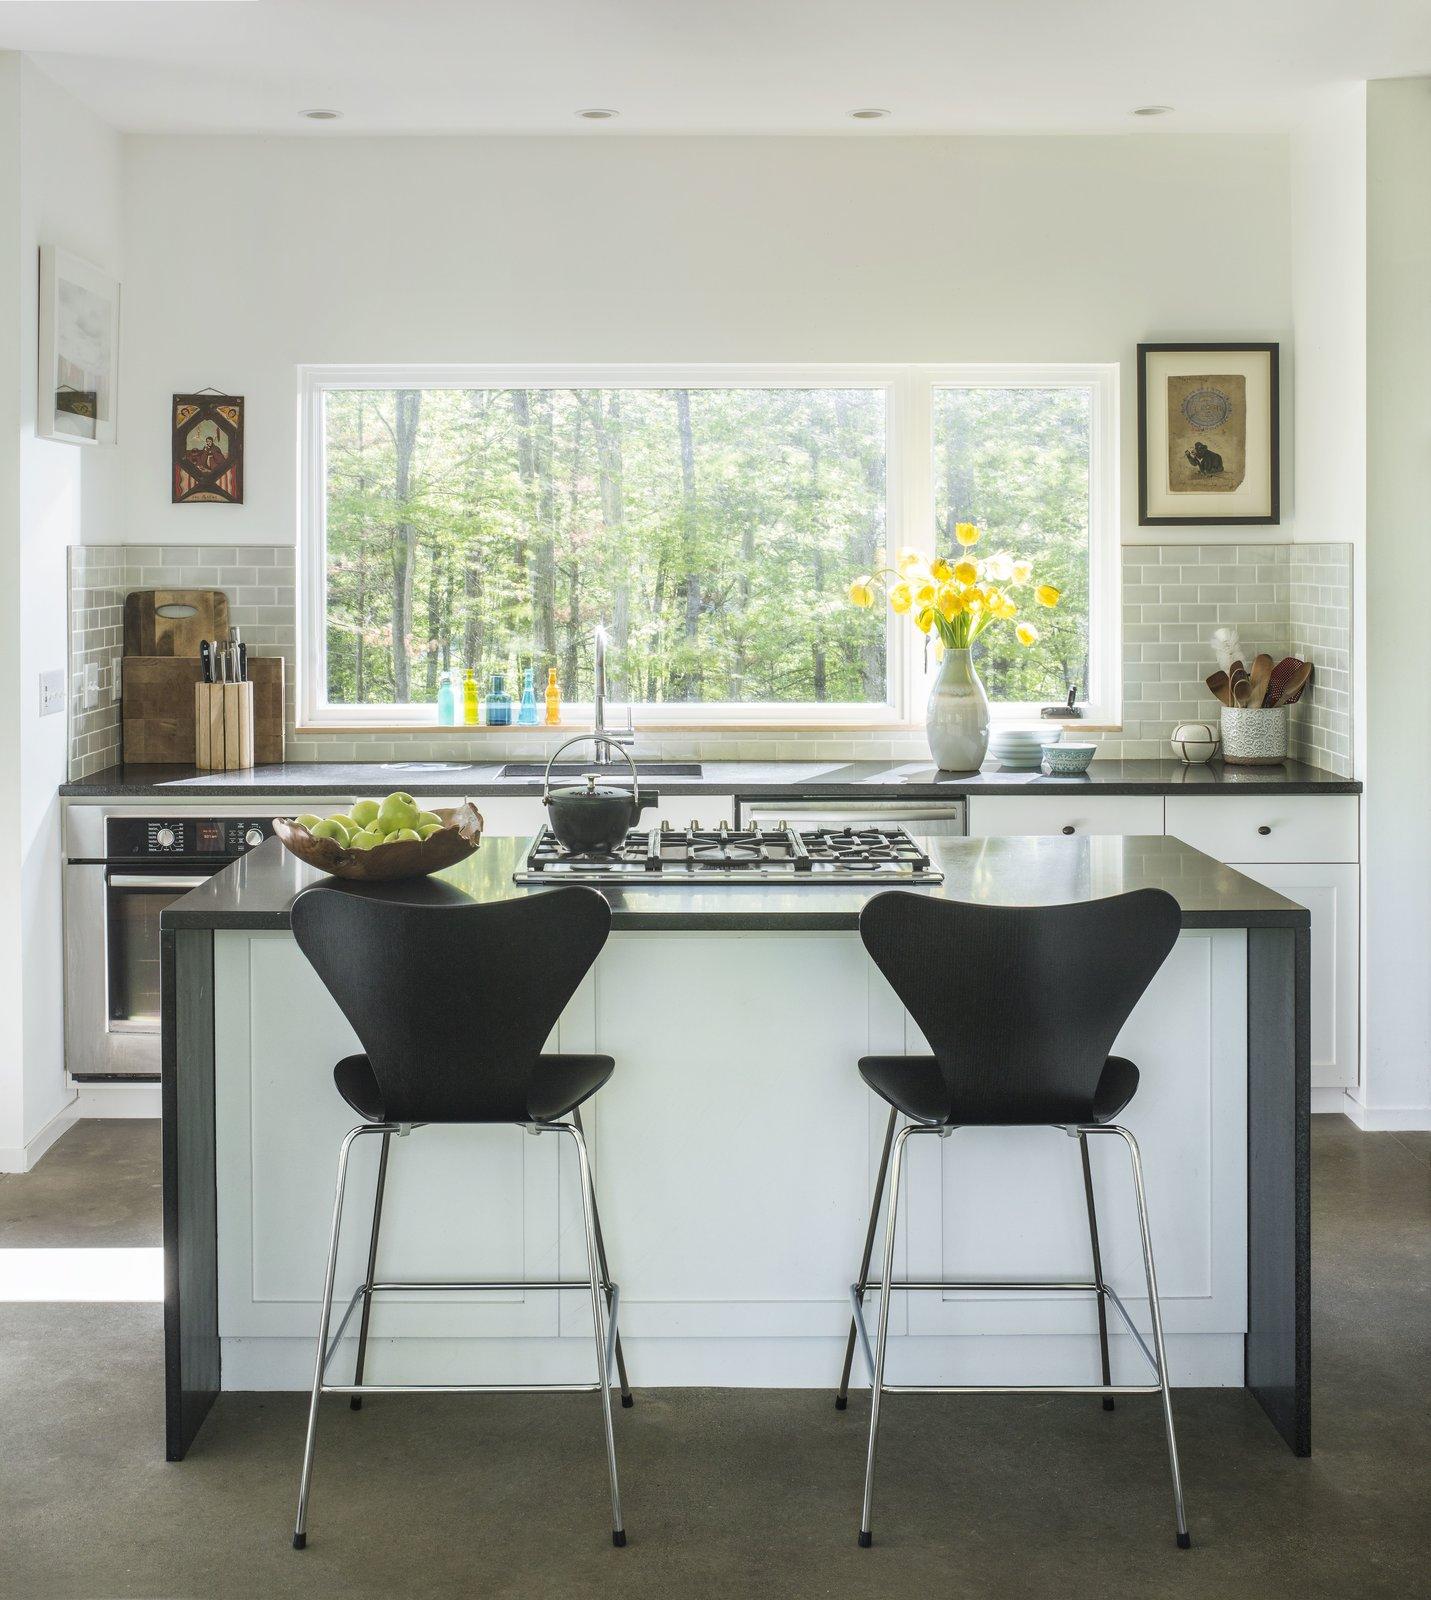 Kitchen, Engineered Quartz, Subway Tile, Cooktops, Range, Concrete, Dishwasher, Wall Oven, Ceramic Tile, and White  Kitchen Range Subway Tile Photos from Knoll House